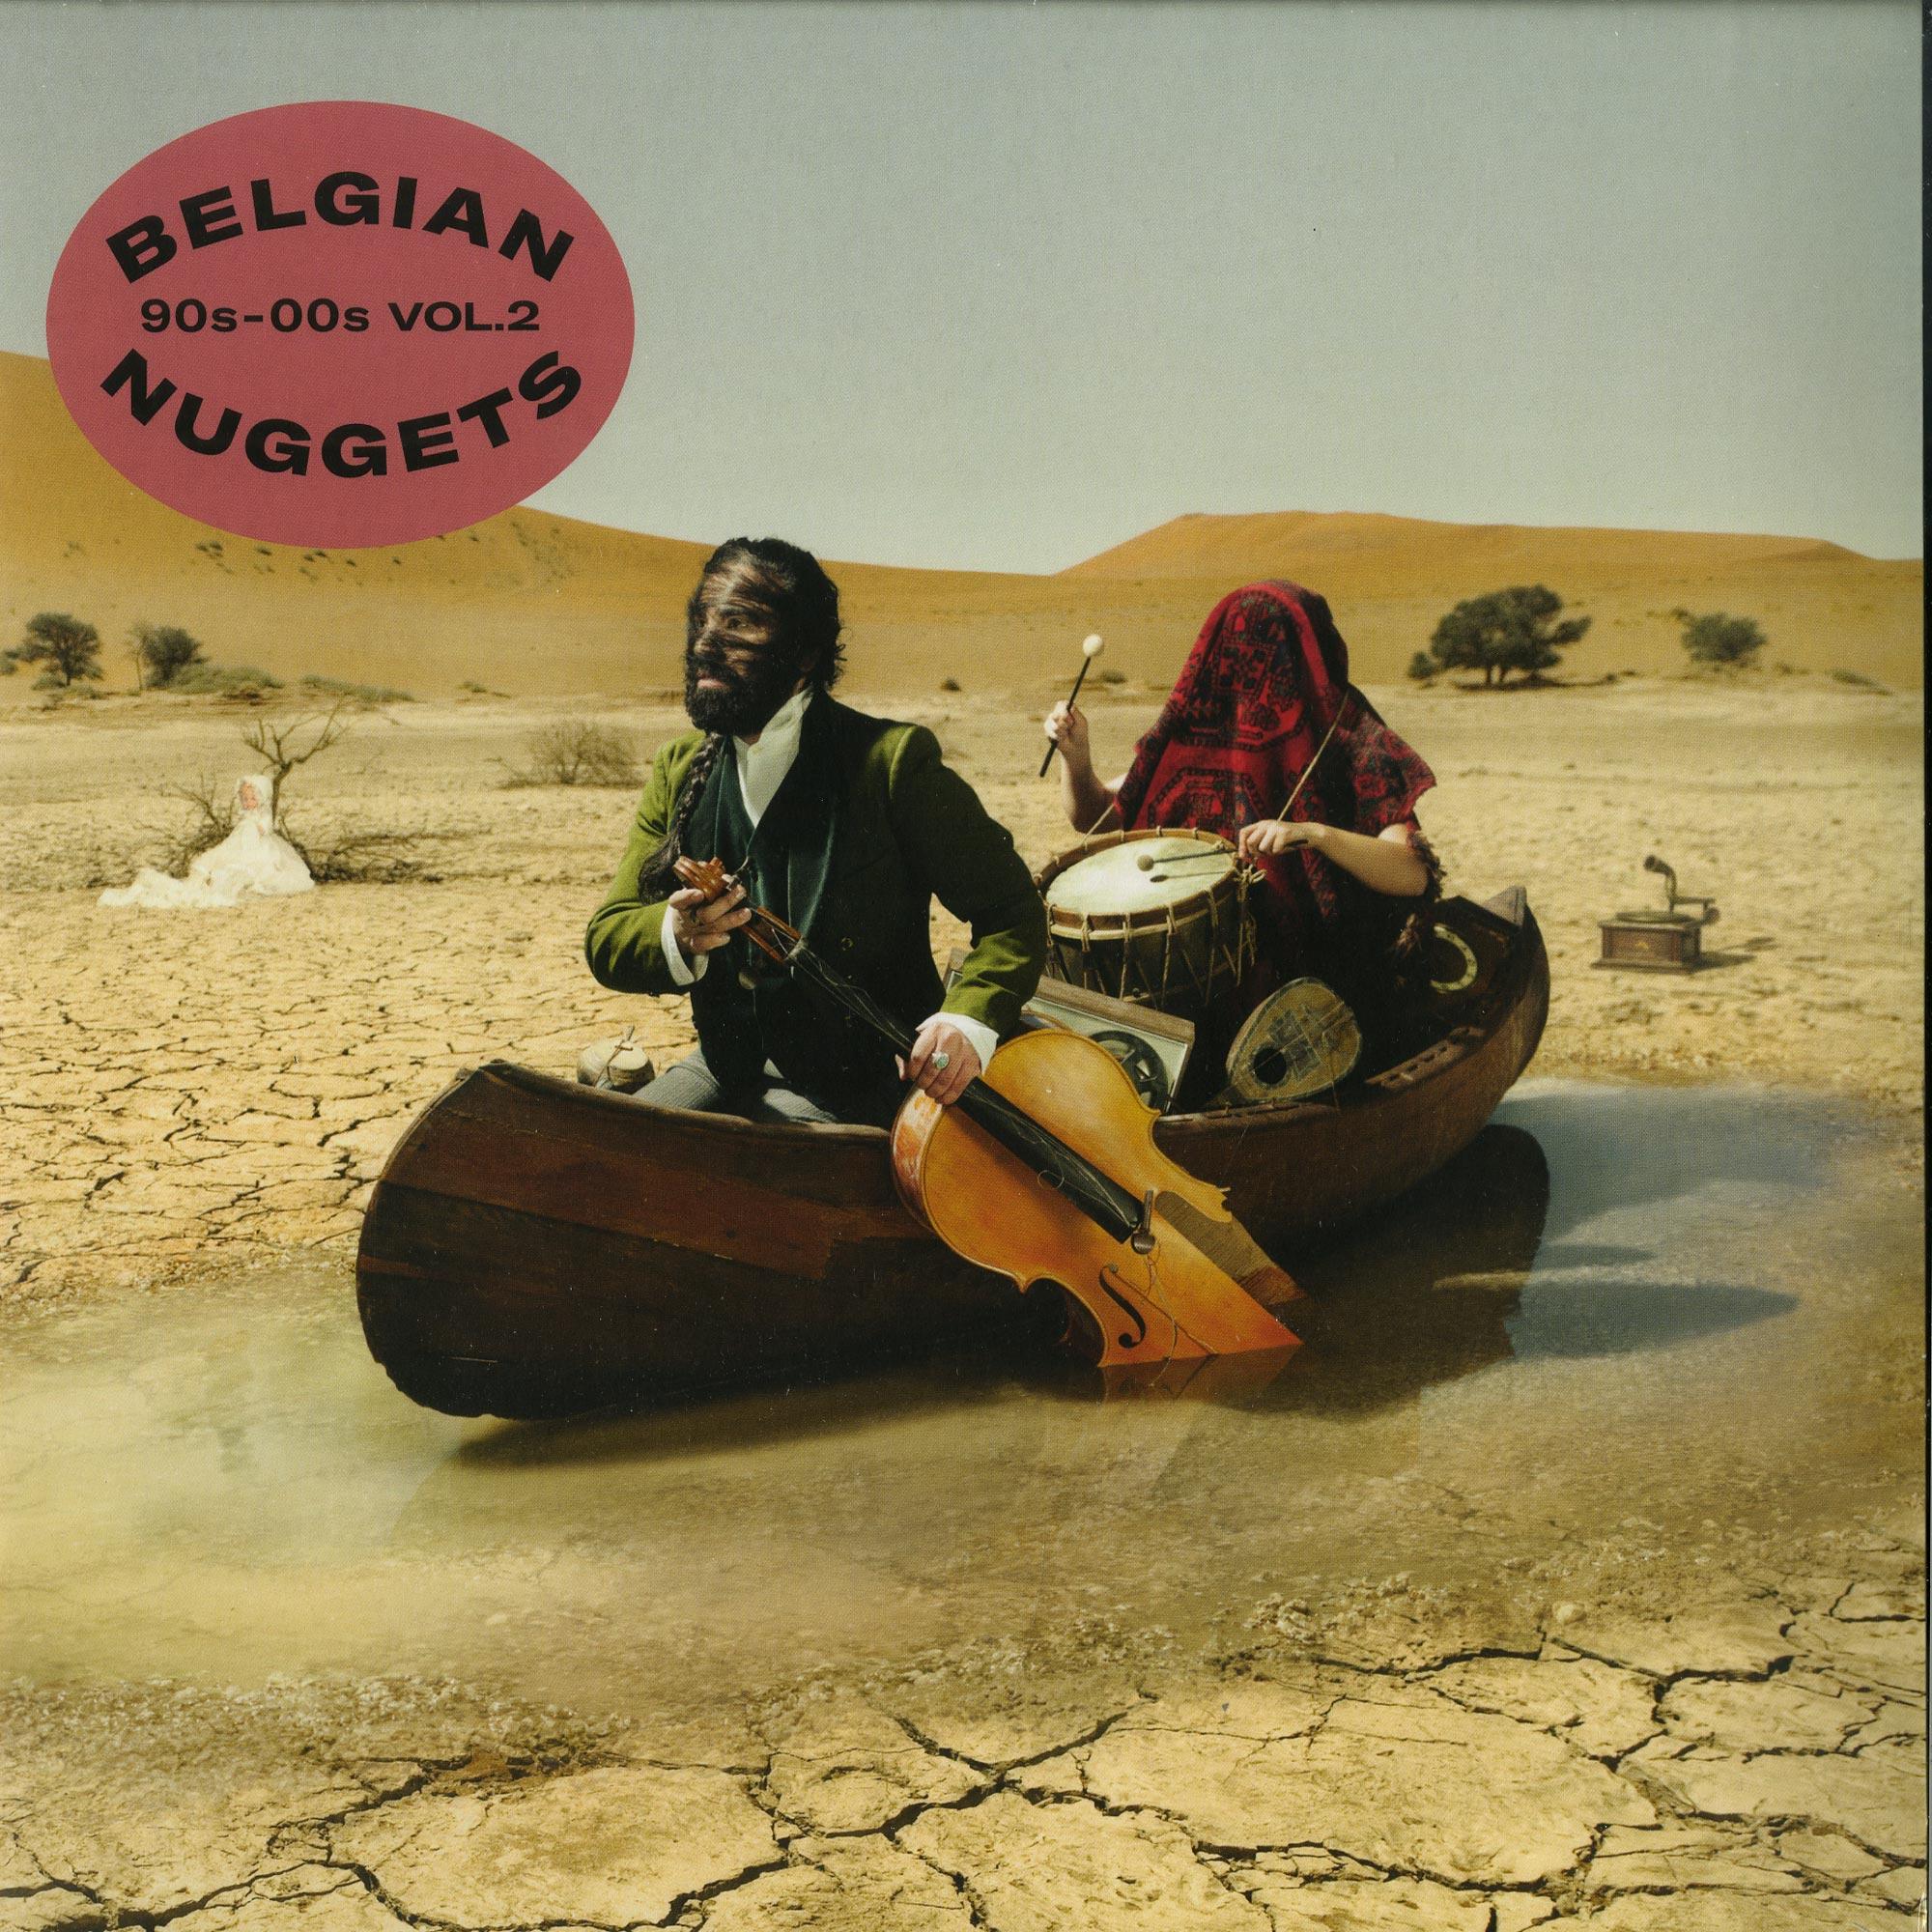 Various Artists - BELGIAN NUGGETS 90s-00s VOL.2